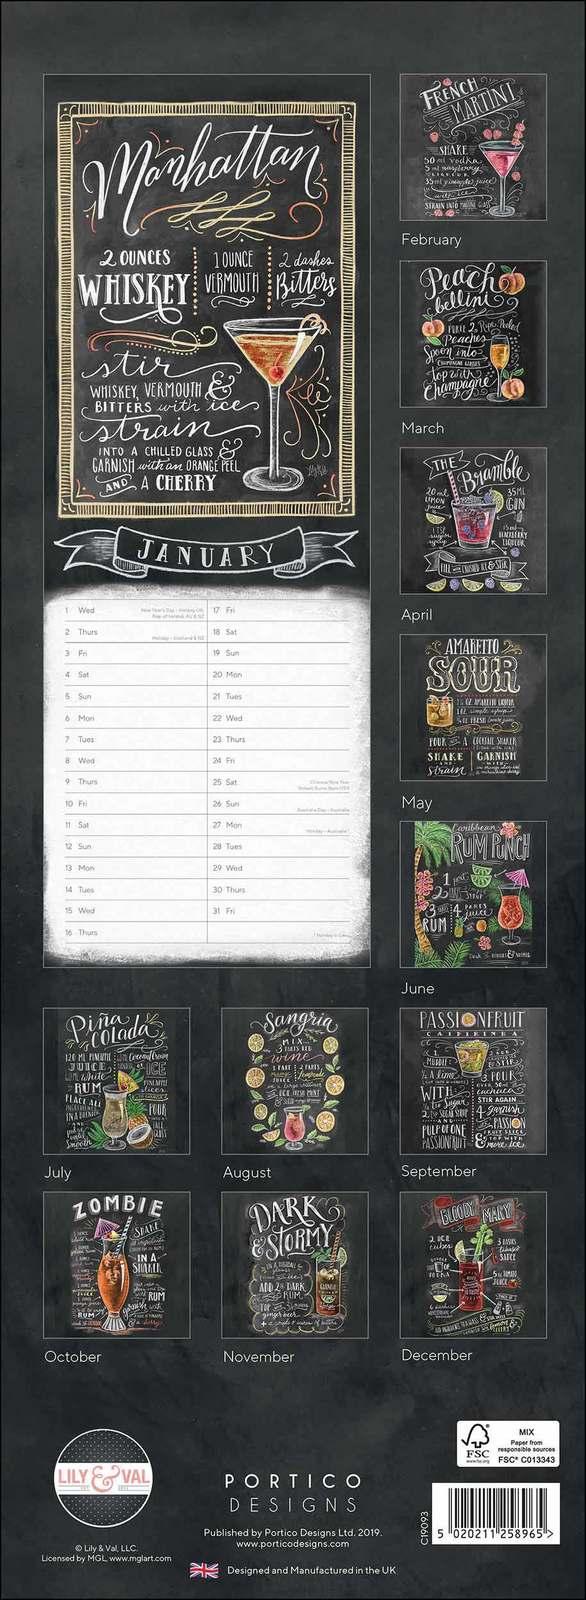 Portico: Lily & Val 2020 Slim Calendar image